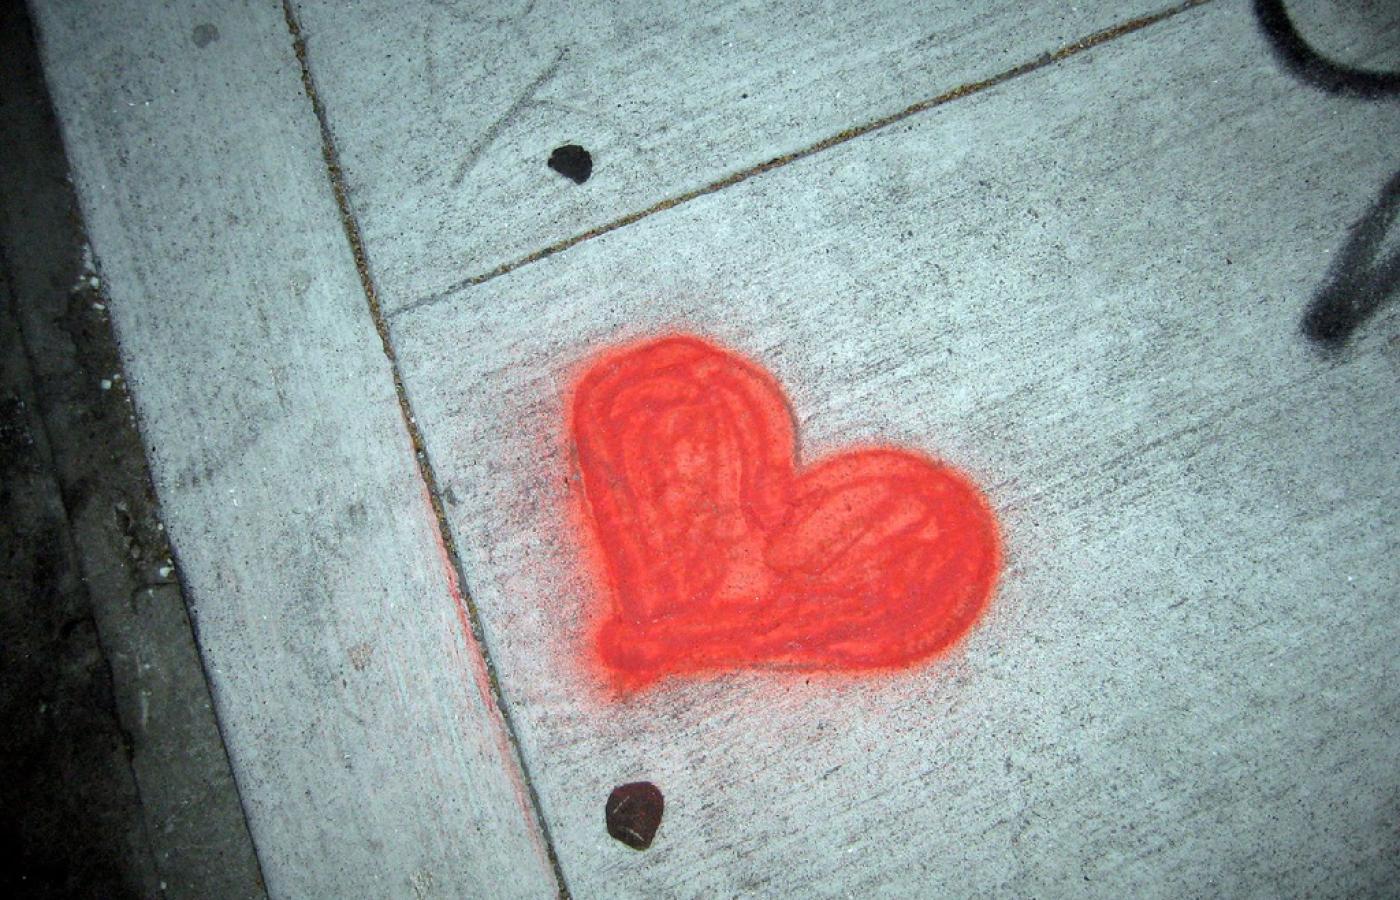 Co oznacza serce i krzyzyk na badoo